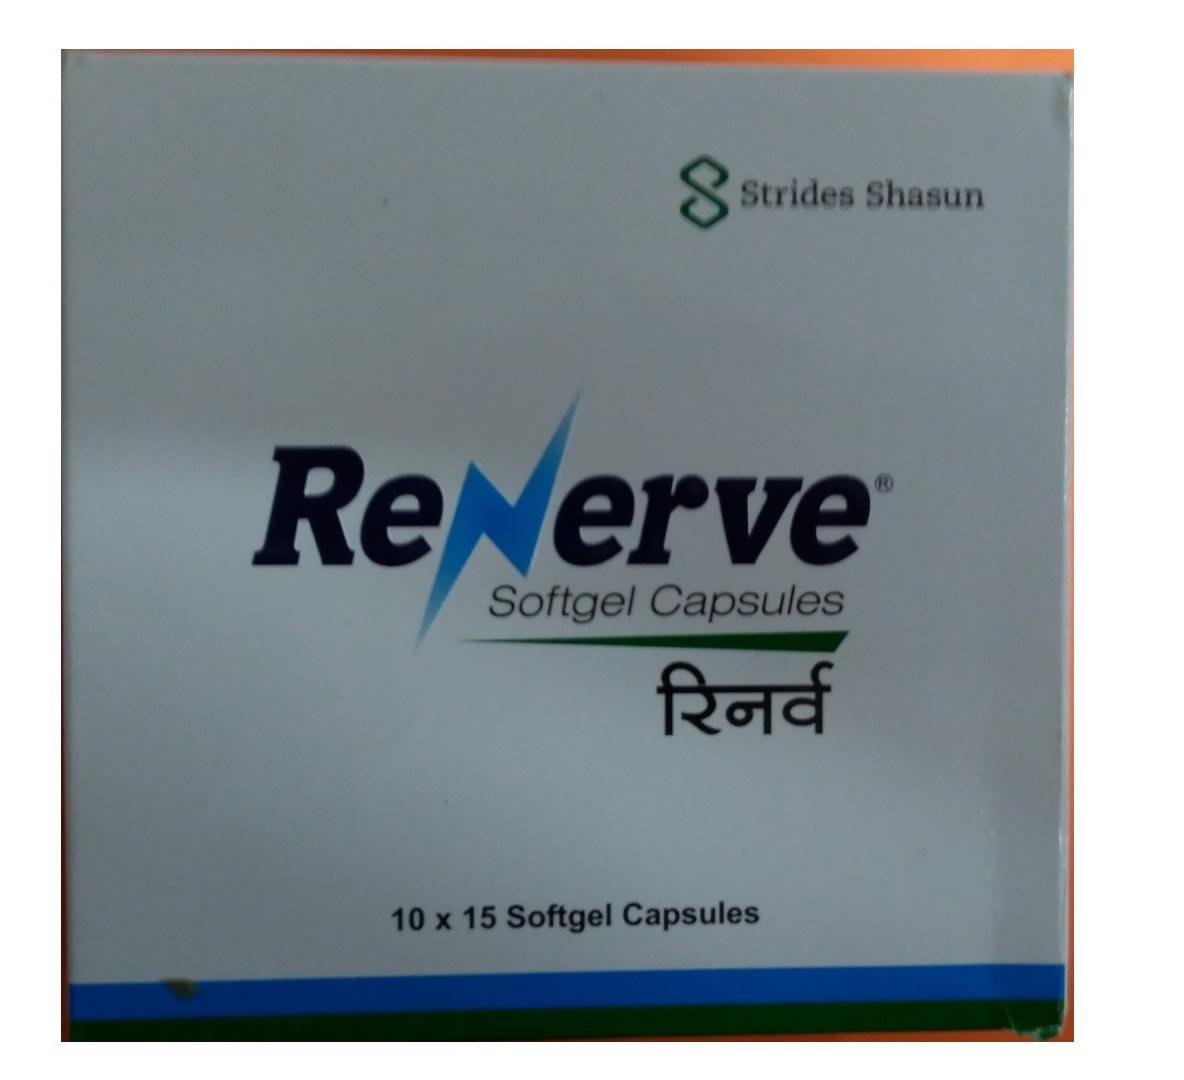 Renerve Soft Gelatin Capsule